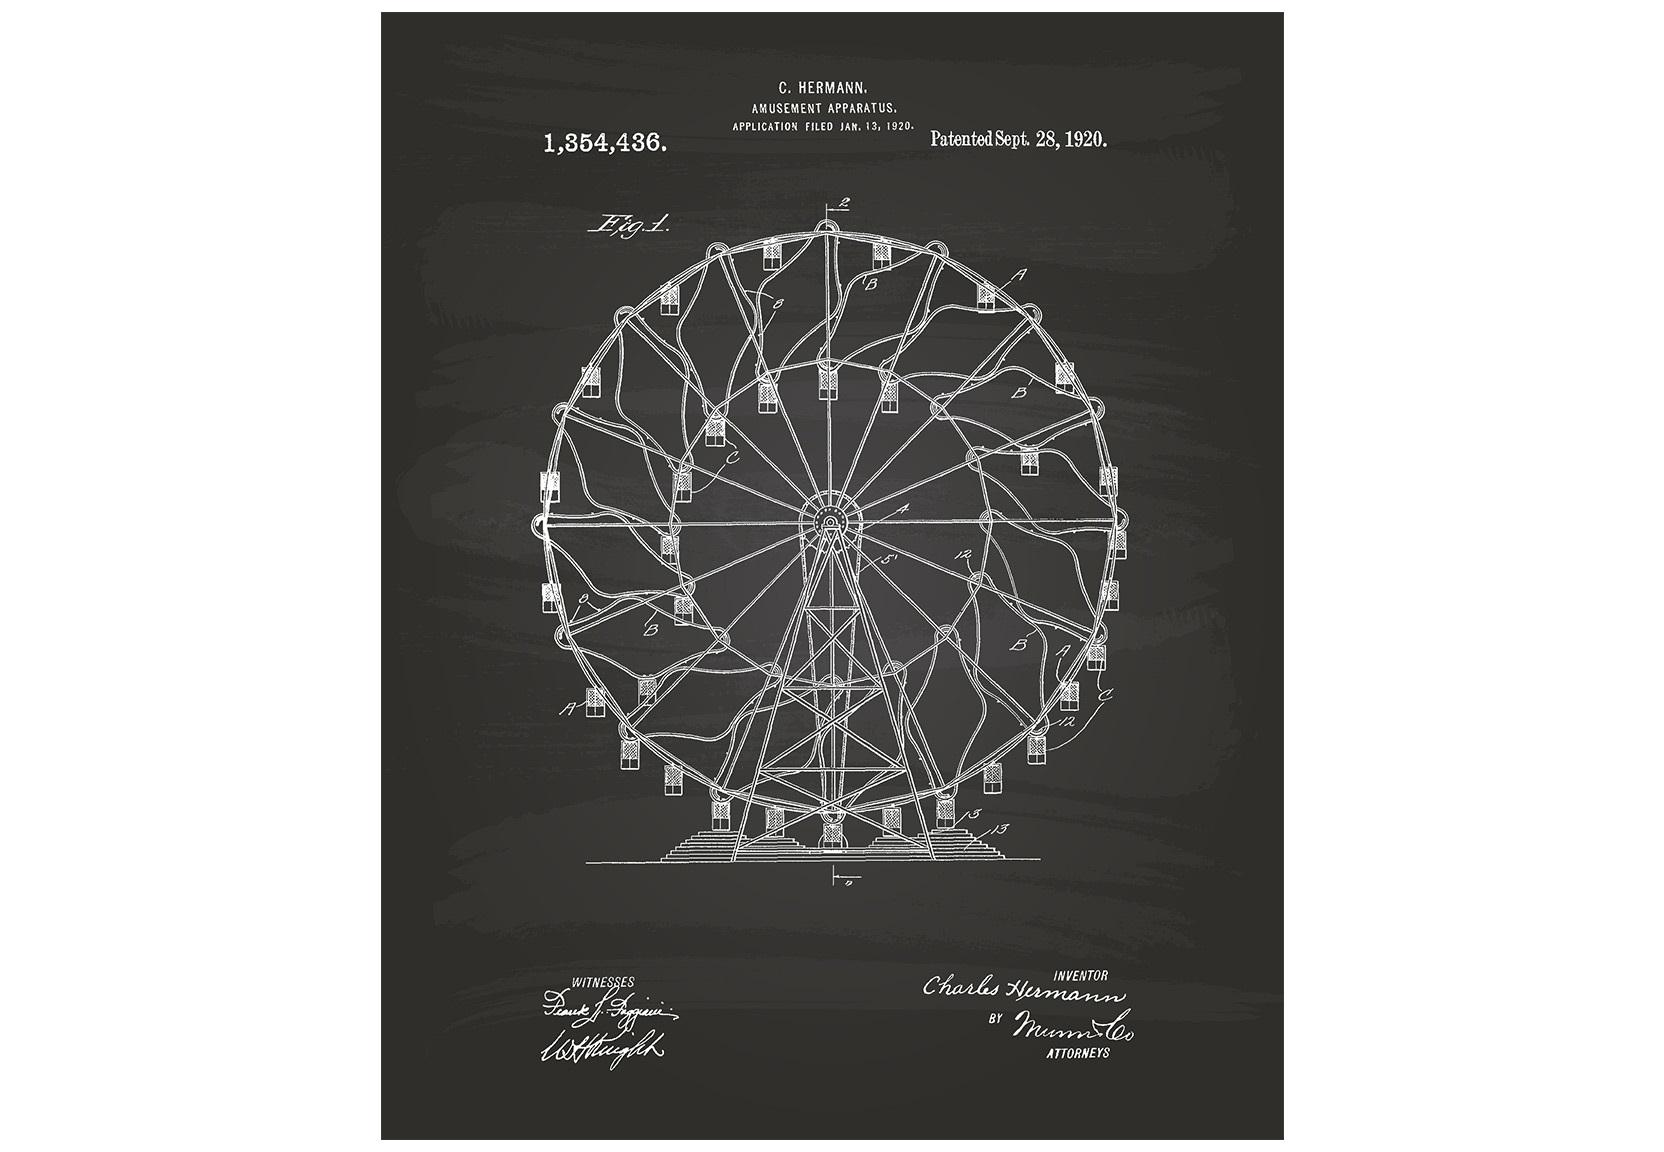 Постер Amusement Apparatus 1920Постеры<br><br><br>Material: Холст<br>Length см: None<br>Width см: 40<br>Depth см: 6<br>Height см: 60